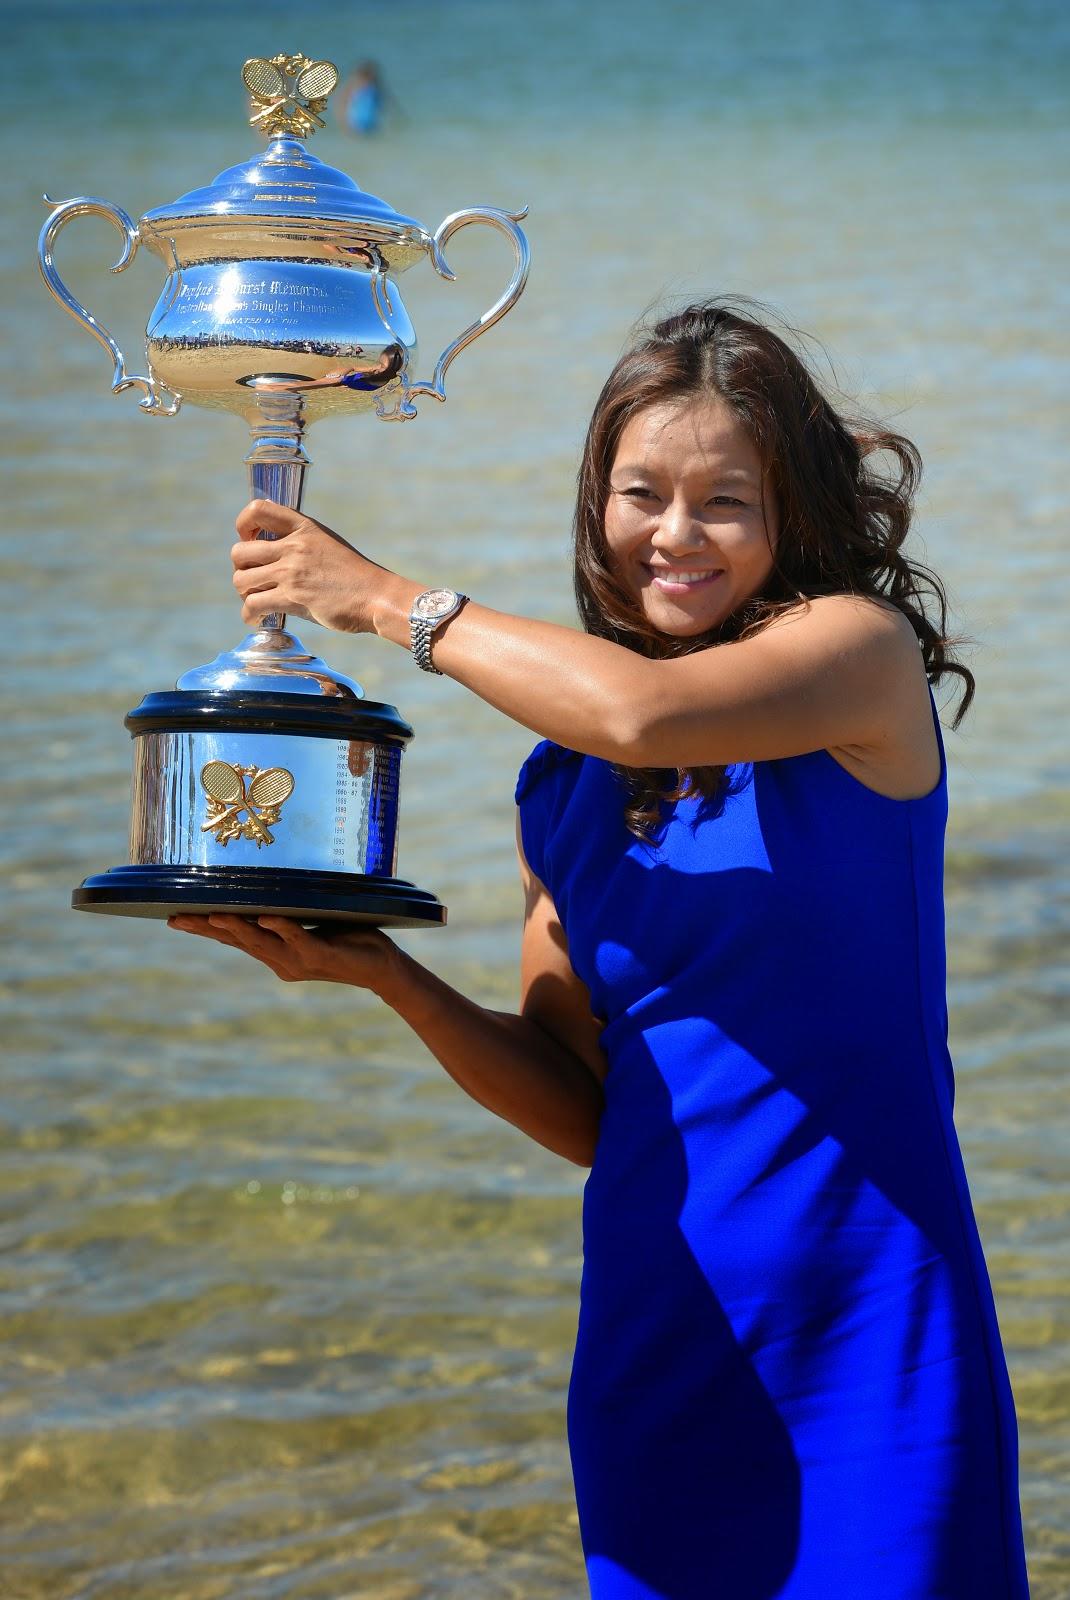 Chinese Tennis Star Li Na HD Photos   Wallpapers of Li Na